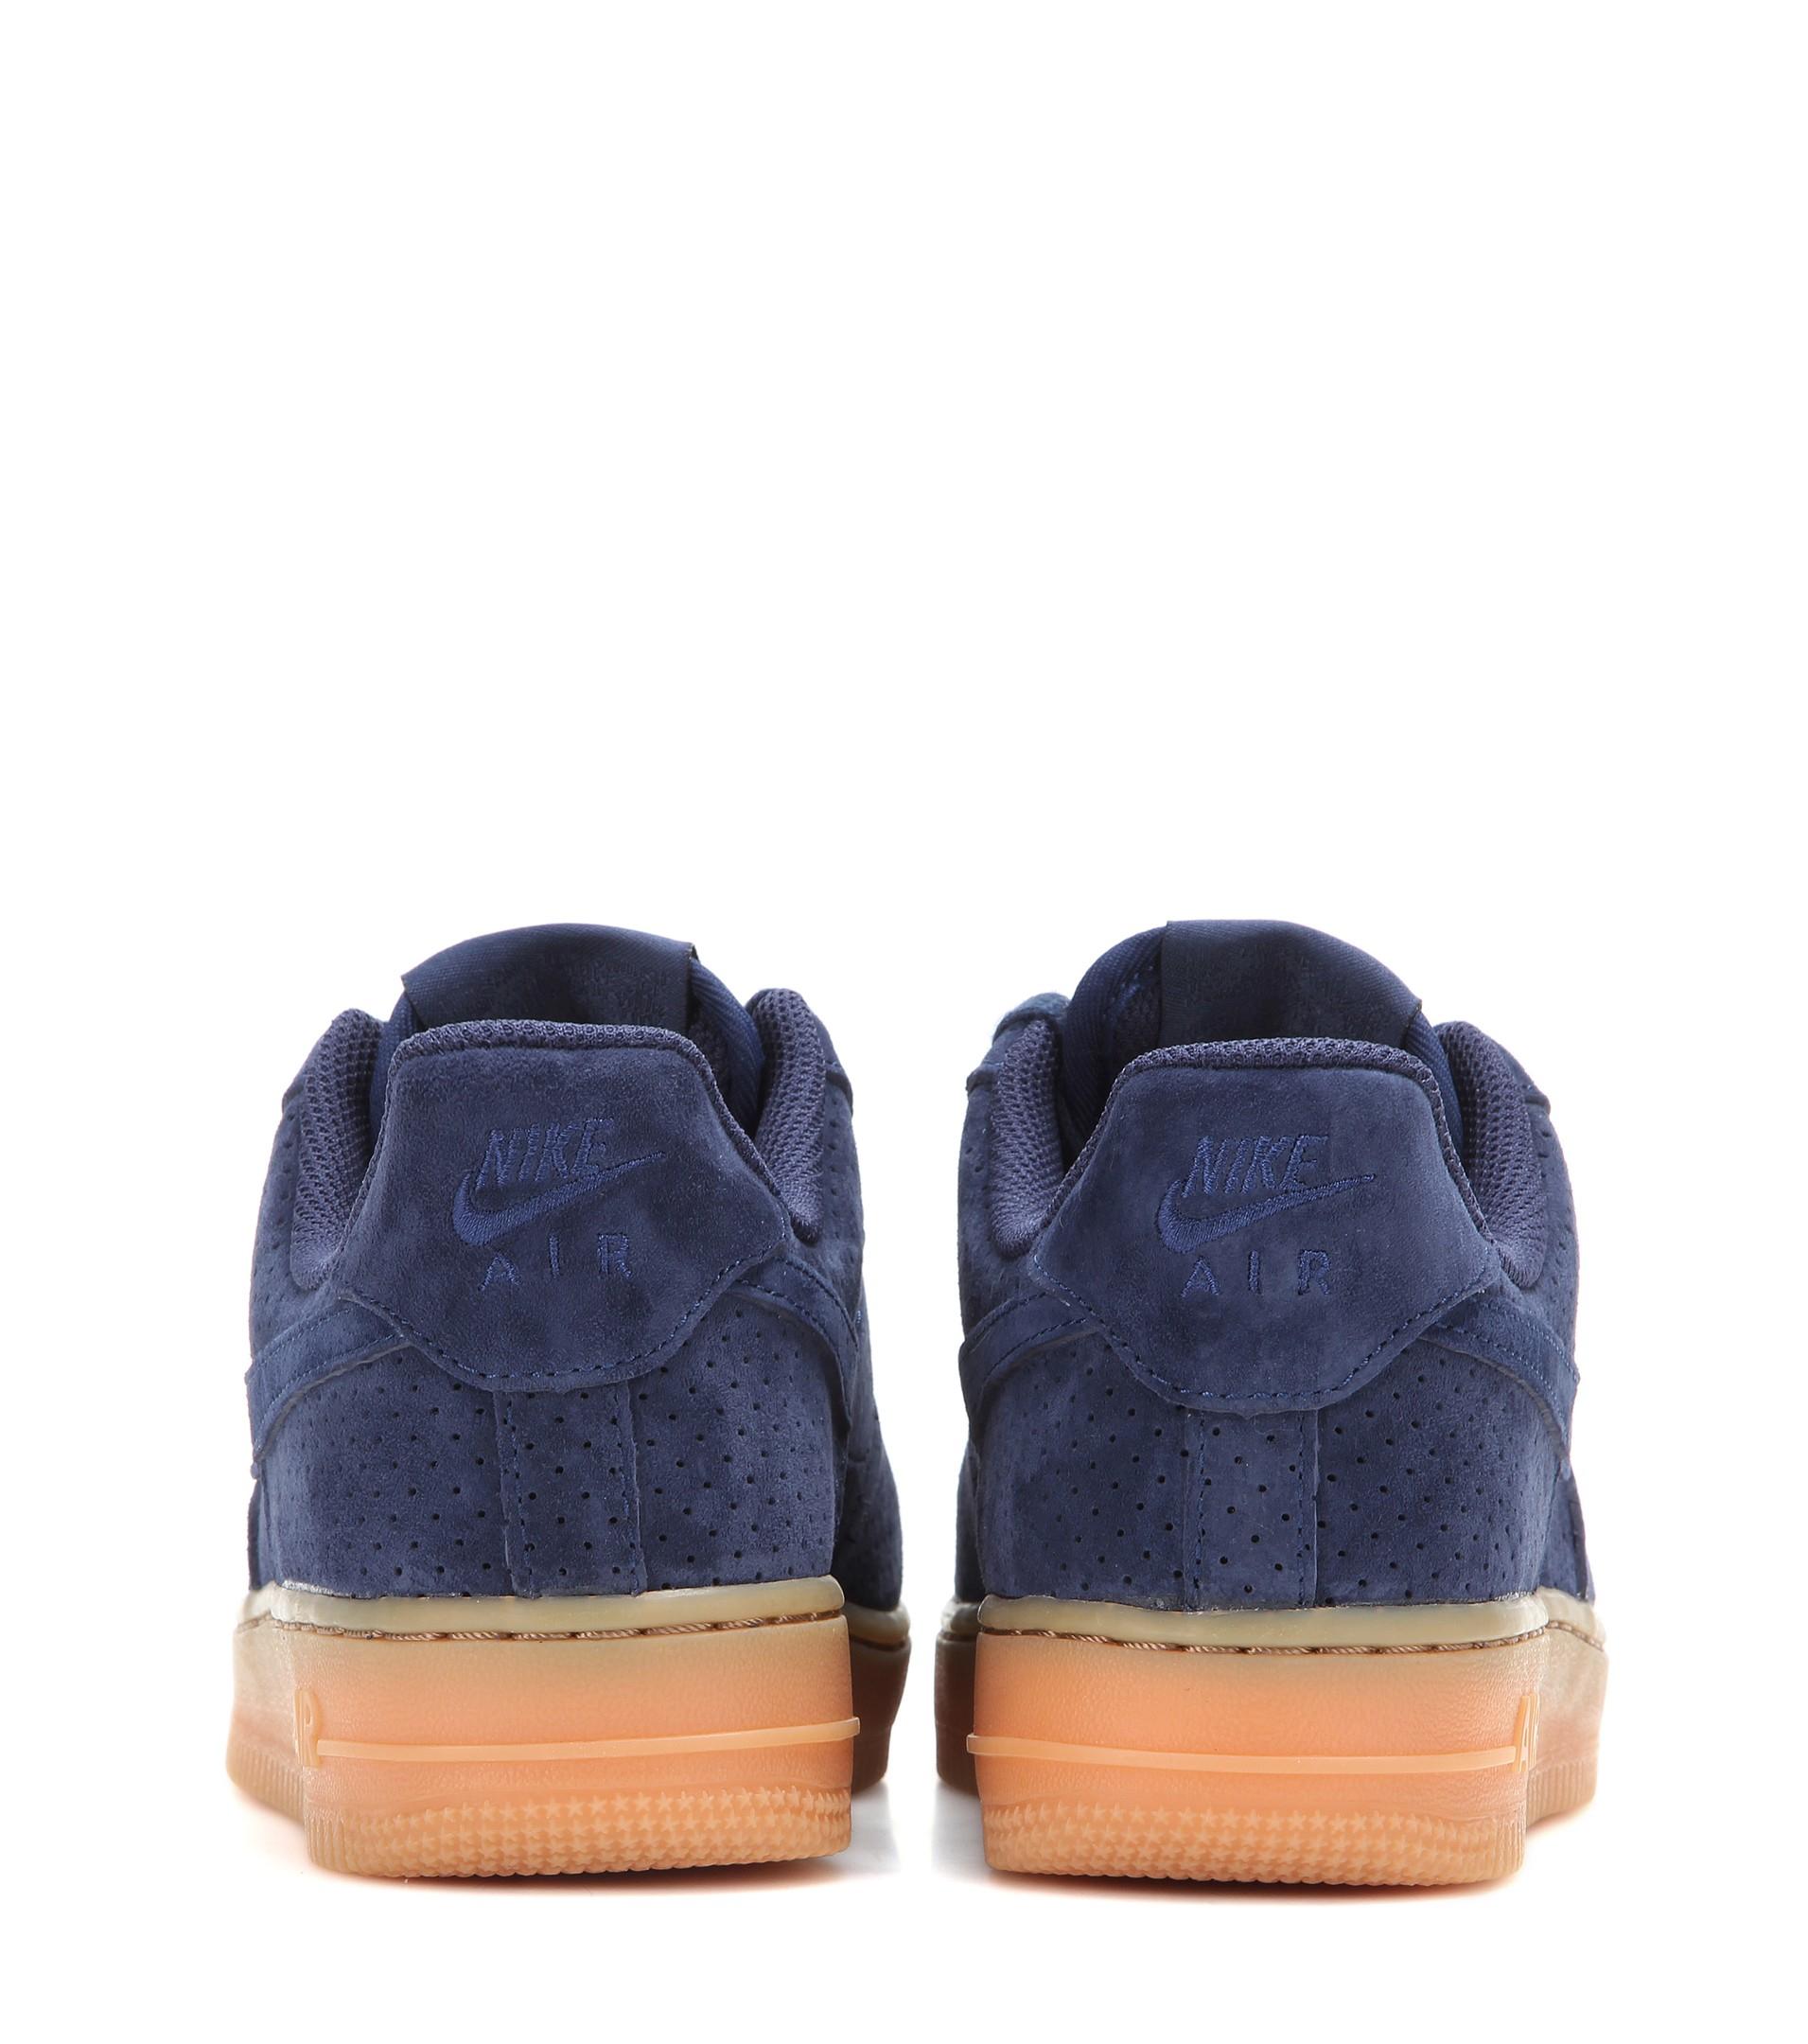 lyst nike air force 1 scamosciato scarpe in blu